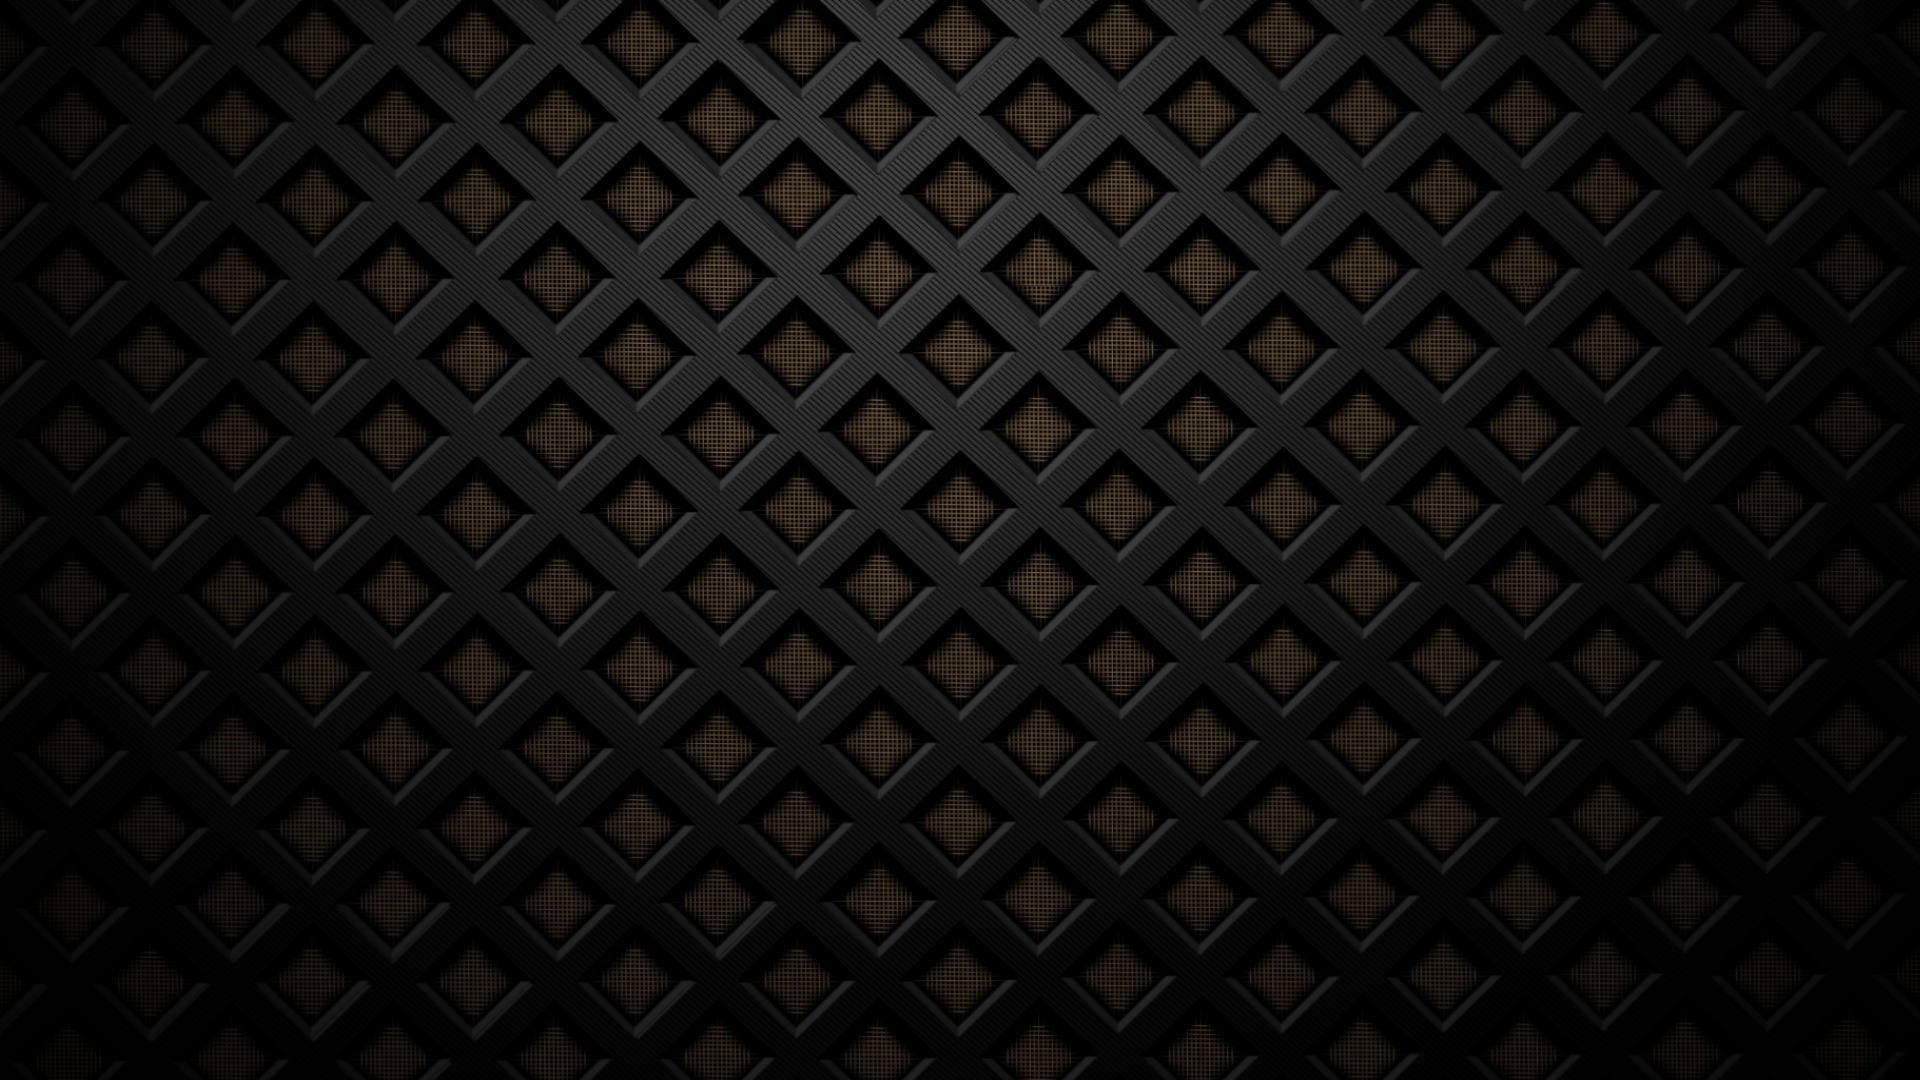 High Resolution Textured Black 3D Wallpaper Full Size 1920x1080